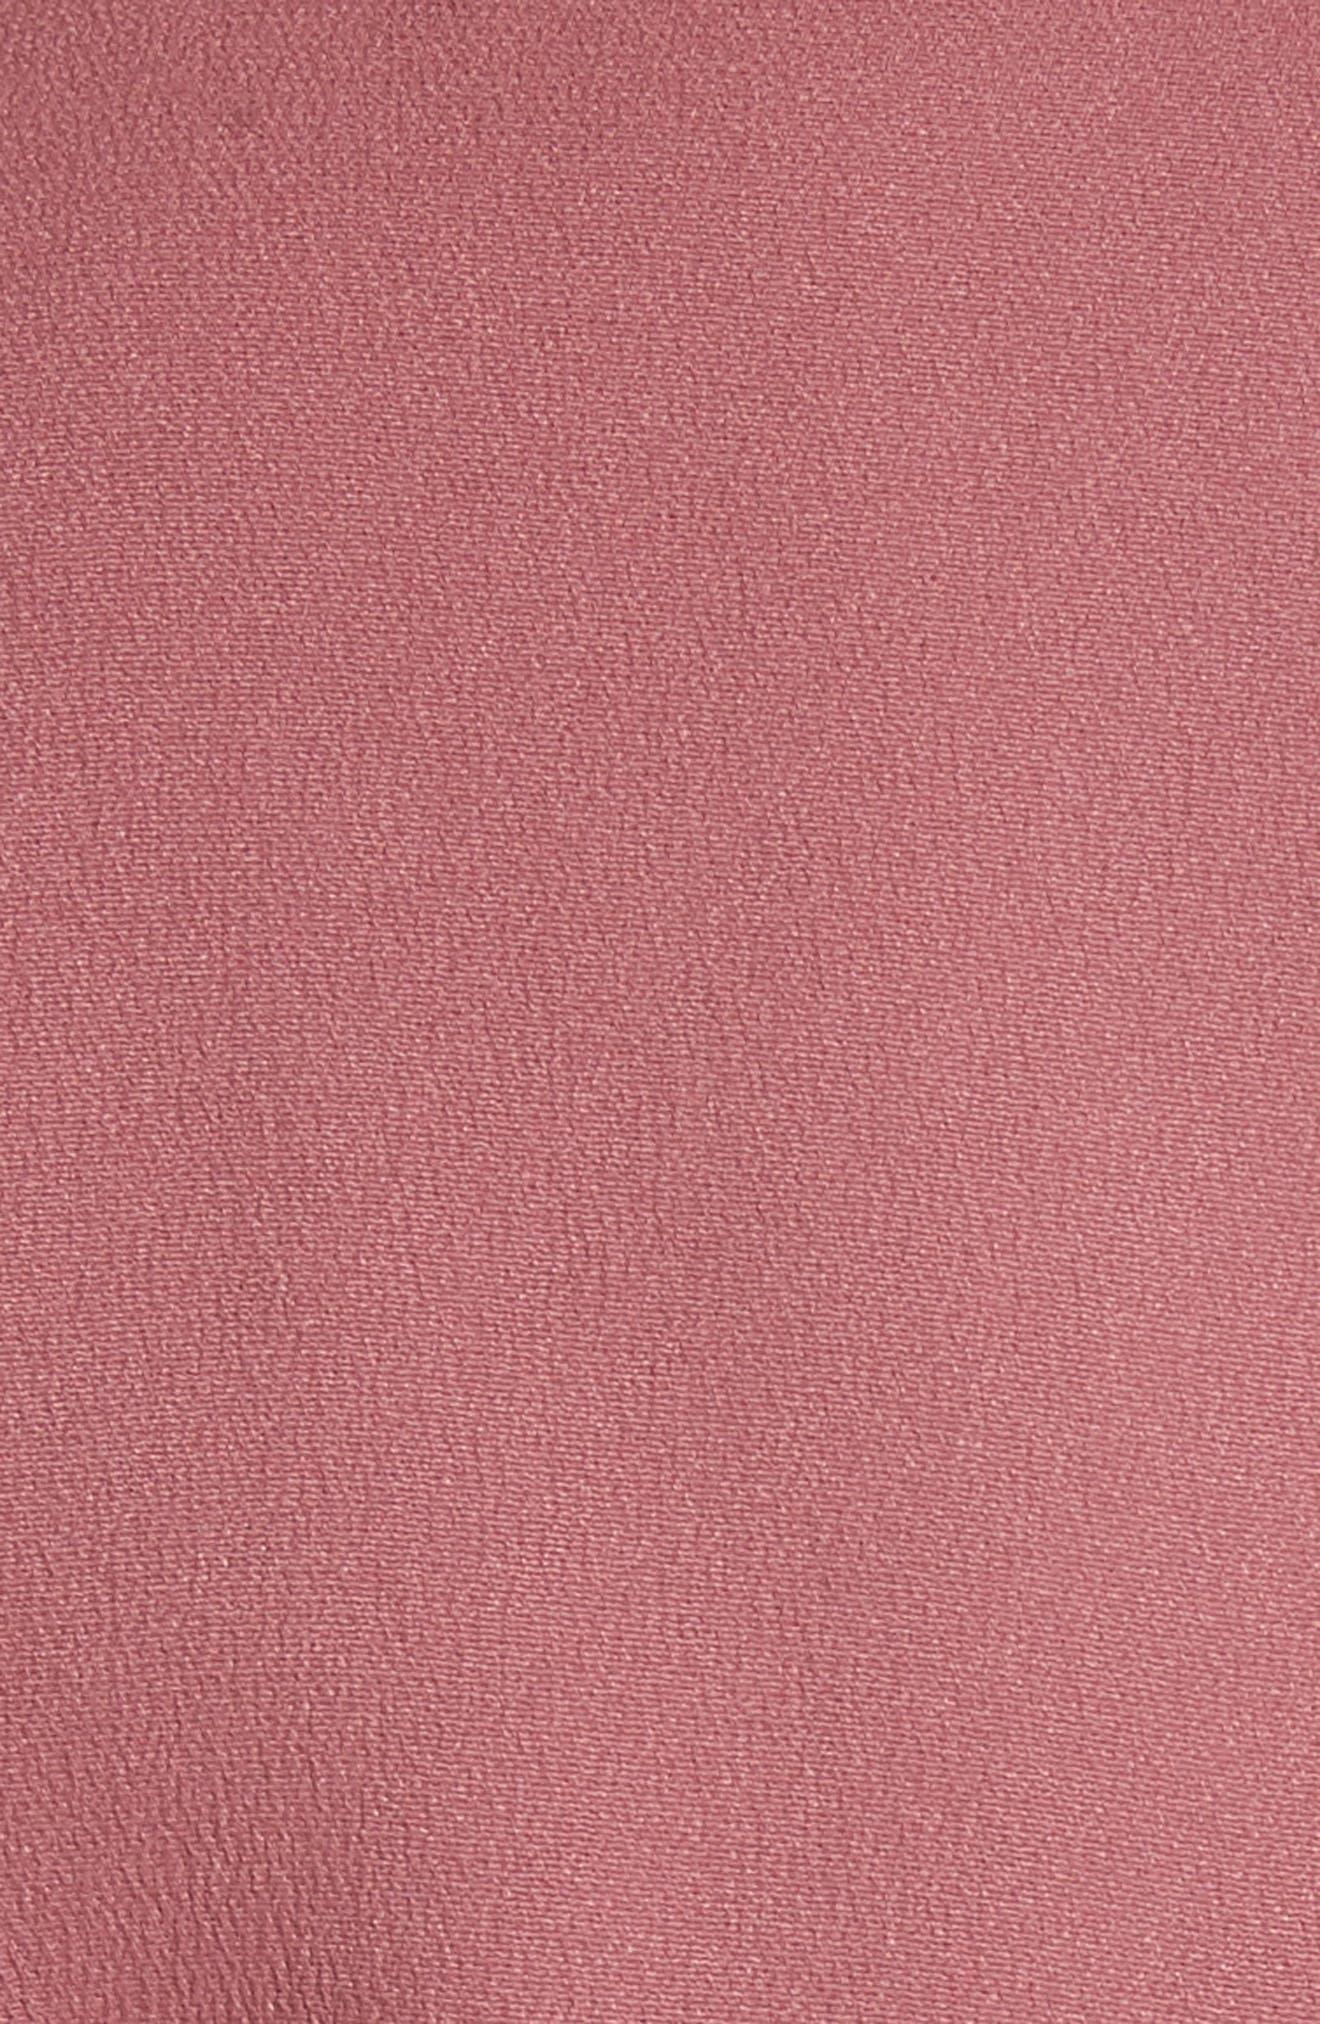 Asymmetrical Fold Bodice Dress,                             Alternate thumbnail 6, color,                             DARK SALMON